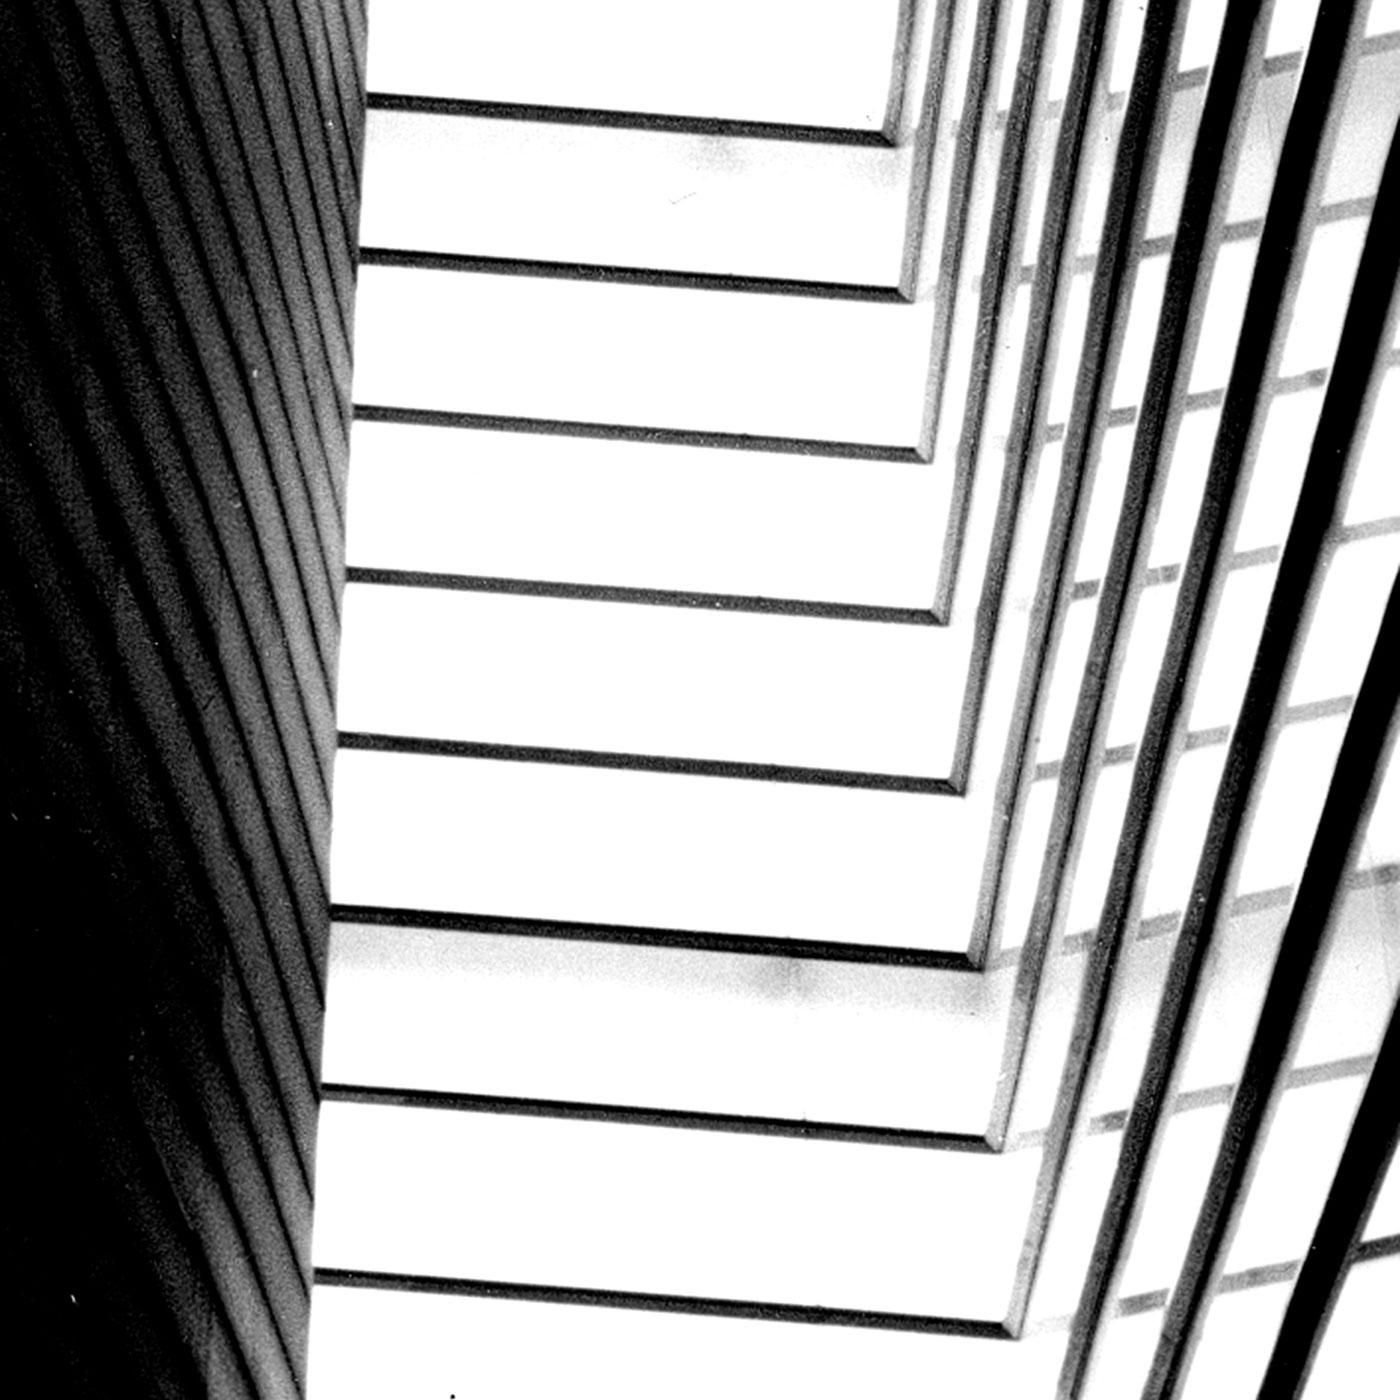 Kursaal-vert-4-bn-1400